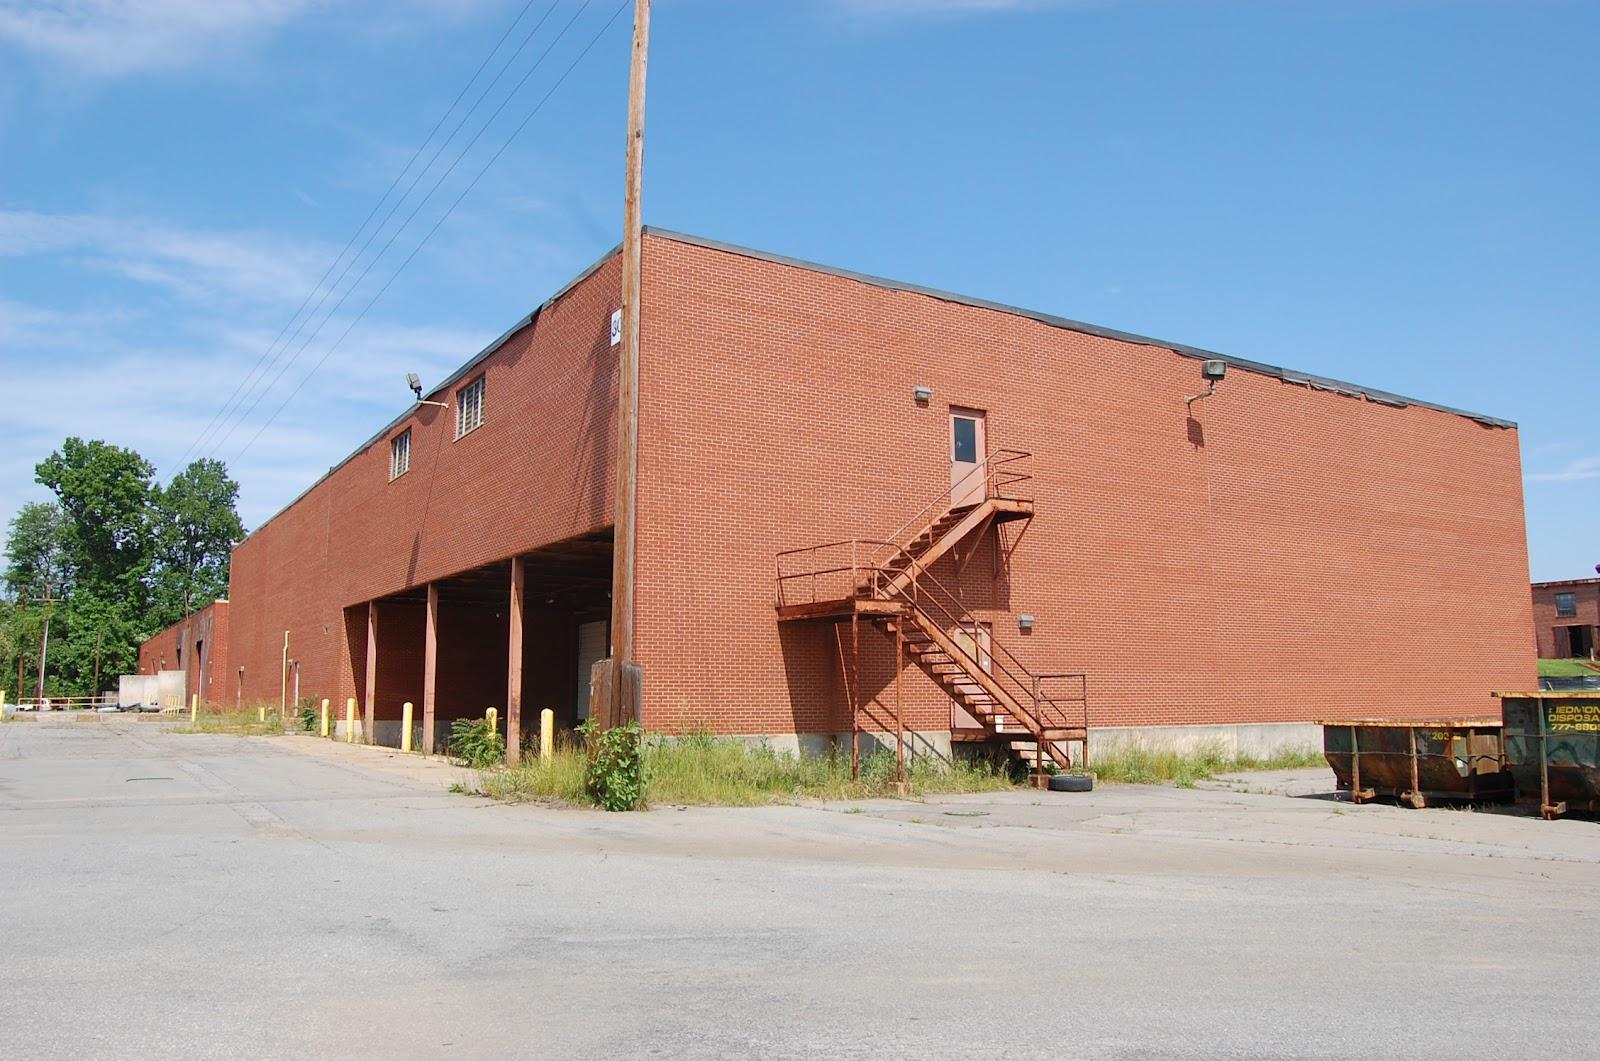 Trucking Company Garage : Mclean trucking company winston salem nc break bulk